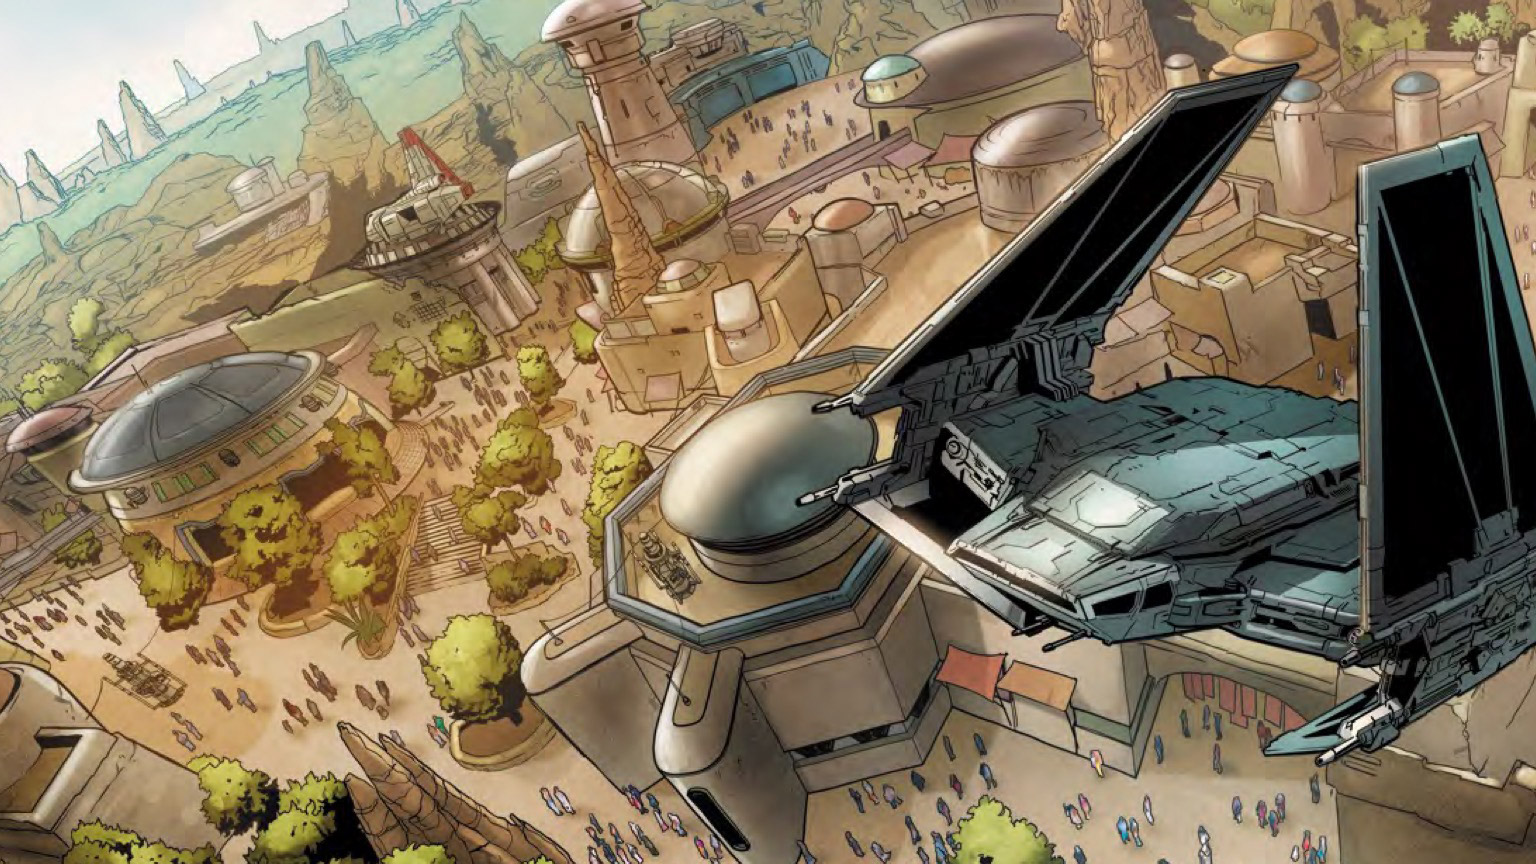 Star Wars: Galaxy's Edge Comic cover art